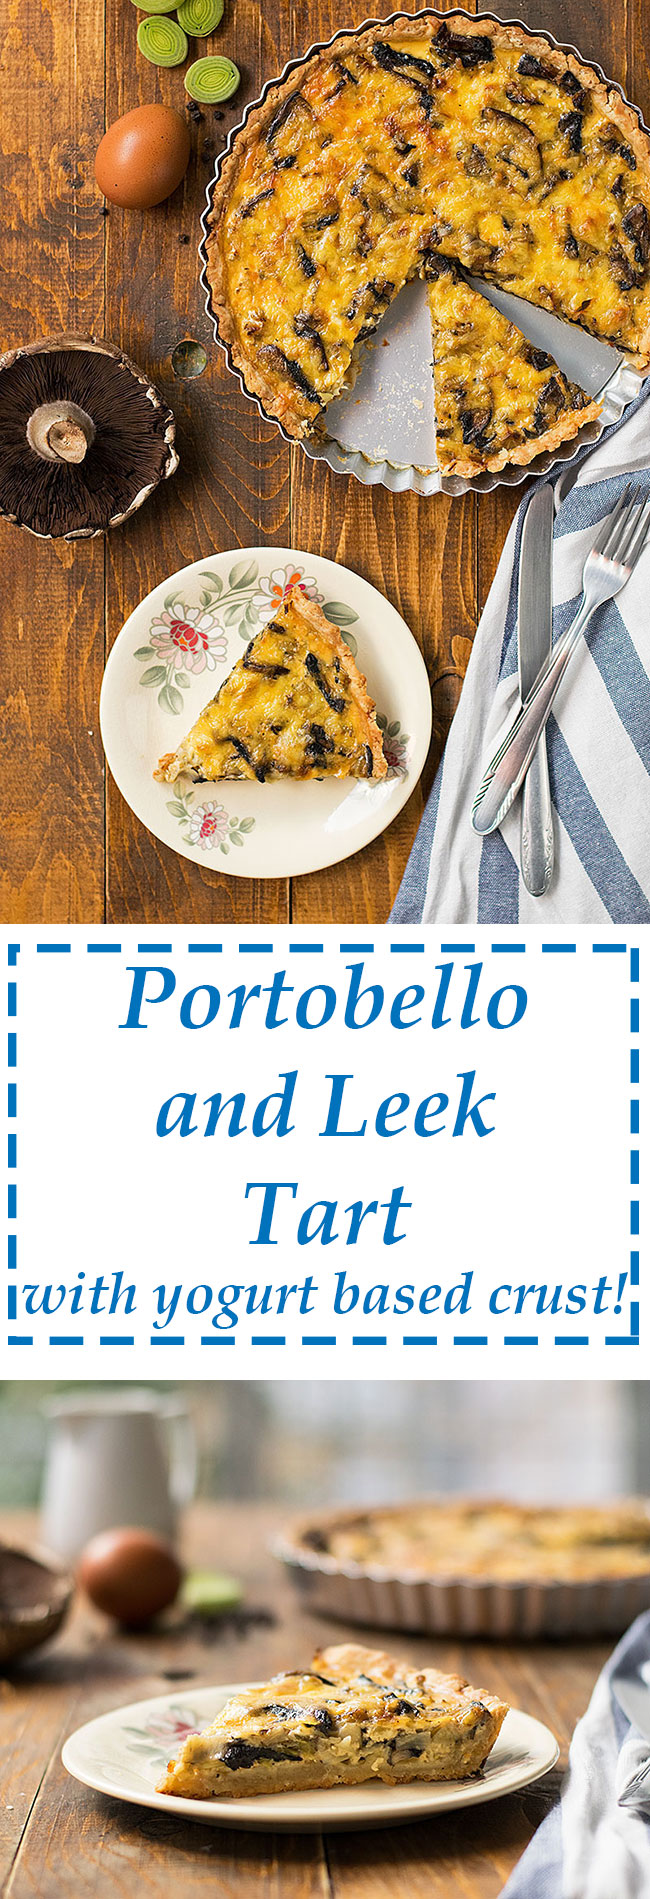 portobello and leek tart   thehungrybites.com